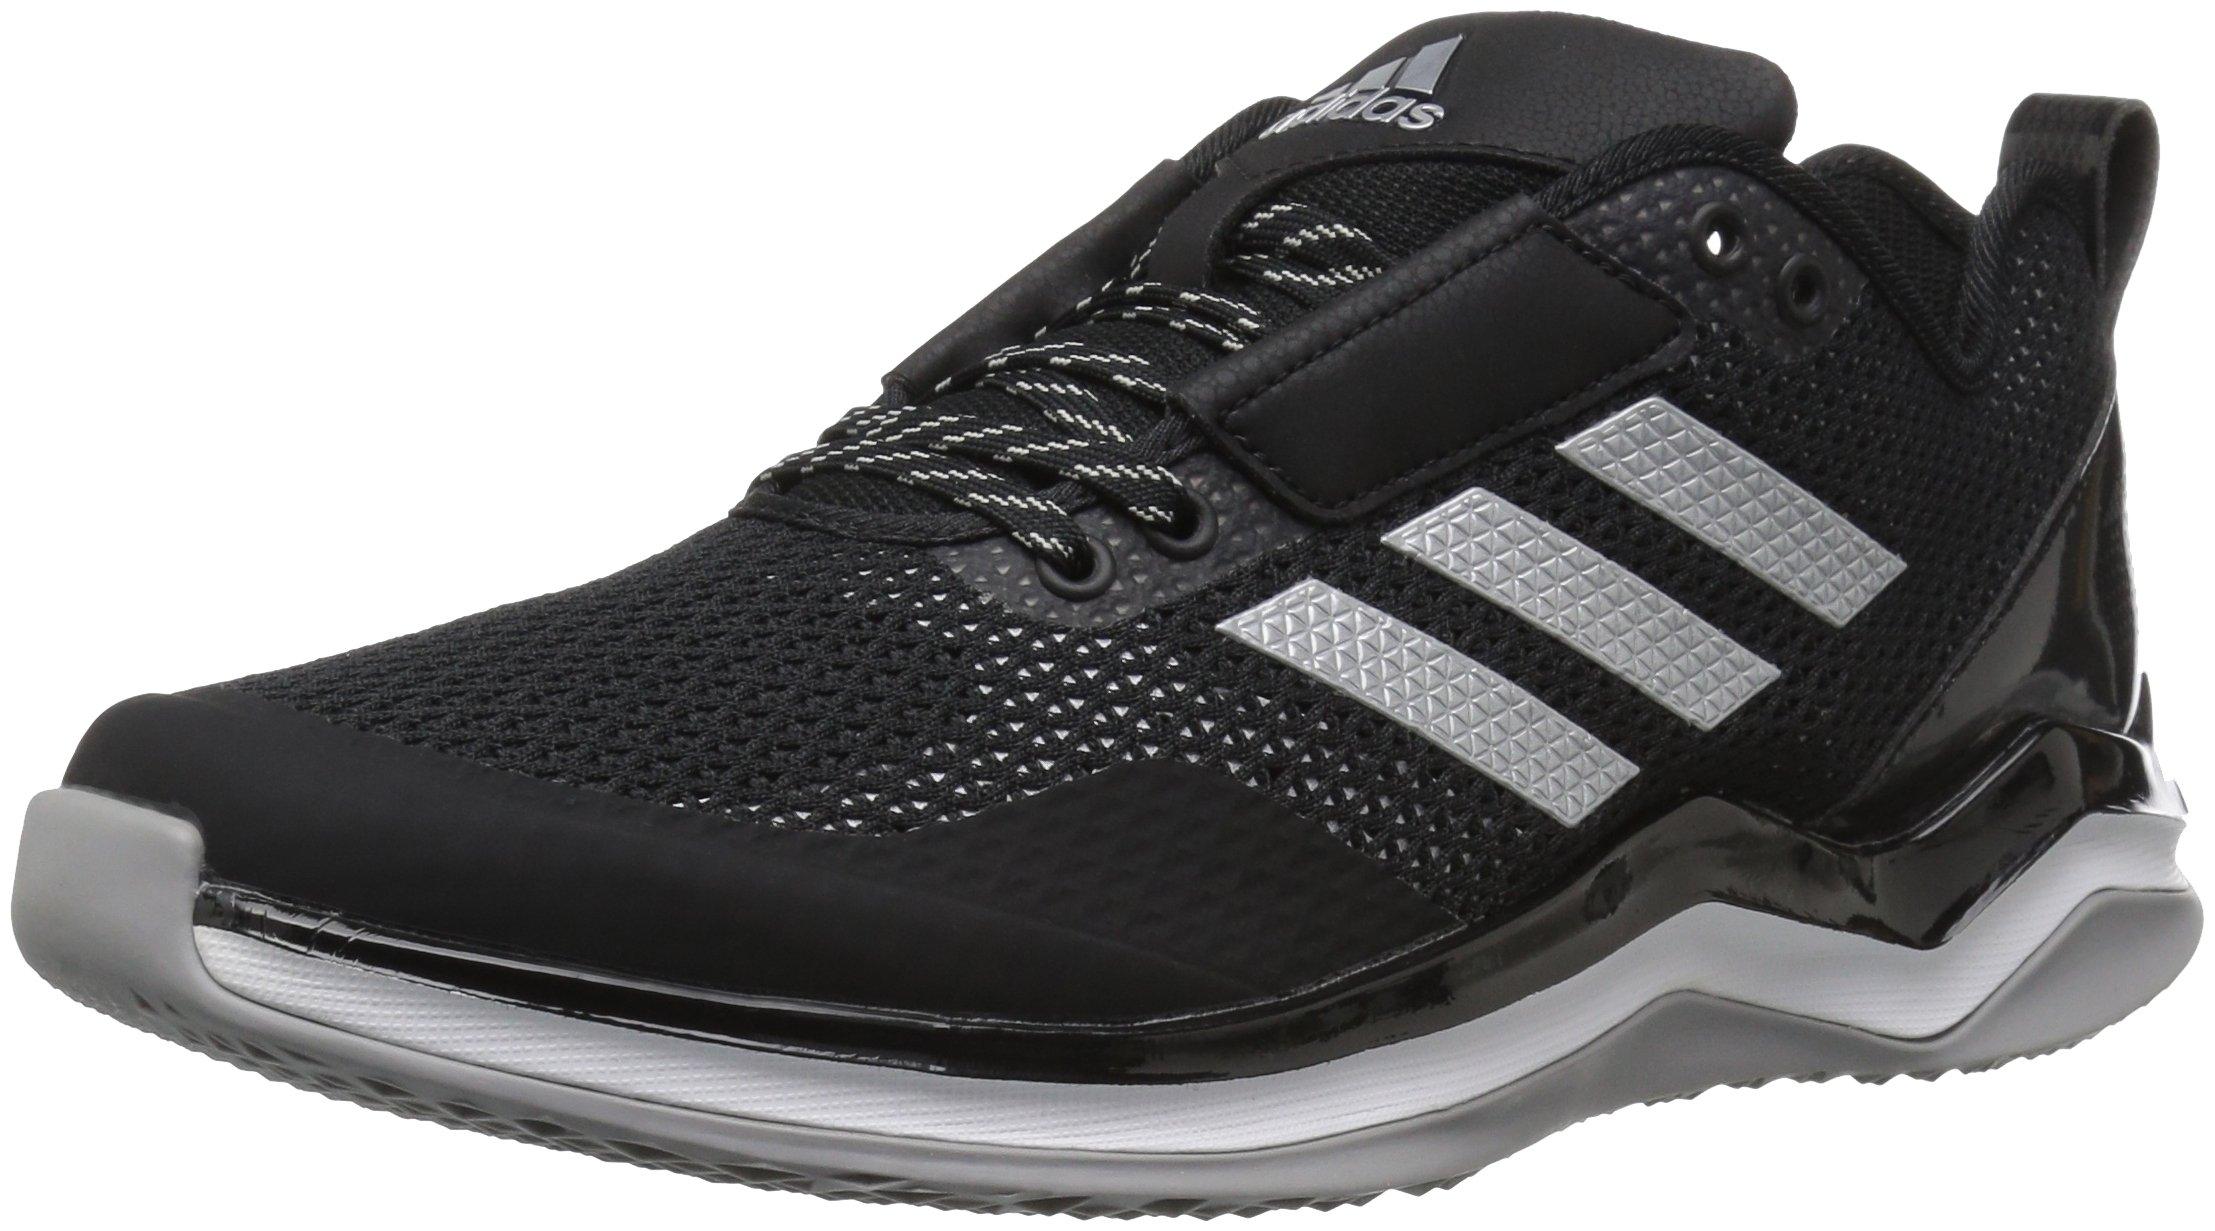 adidas Performance Men's Speed Trainer 3.0 Shoes, Black/Metallic Silver/White, (10 Medium US) by adidas